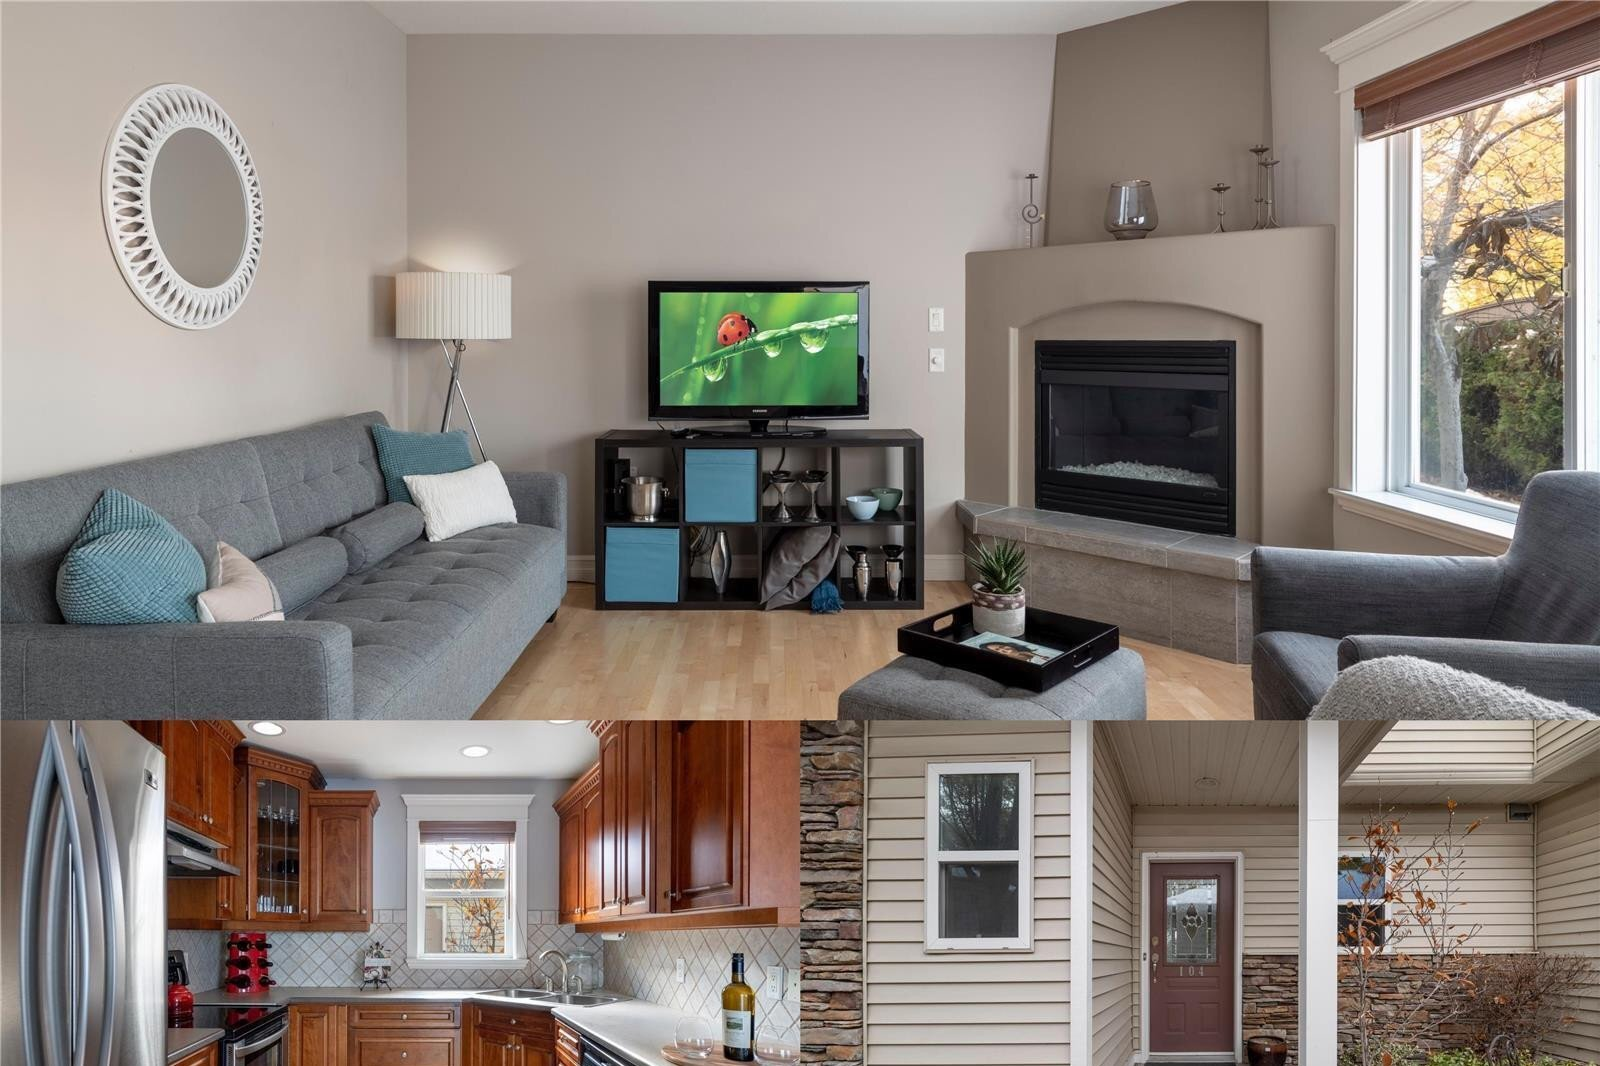 Townhouse for sale at 4049 Lakeshore Rd Unit 104 Kelowna British Columbia - MLS: 10218939